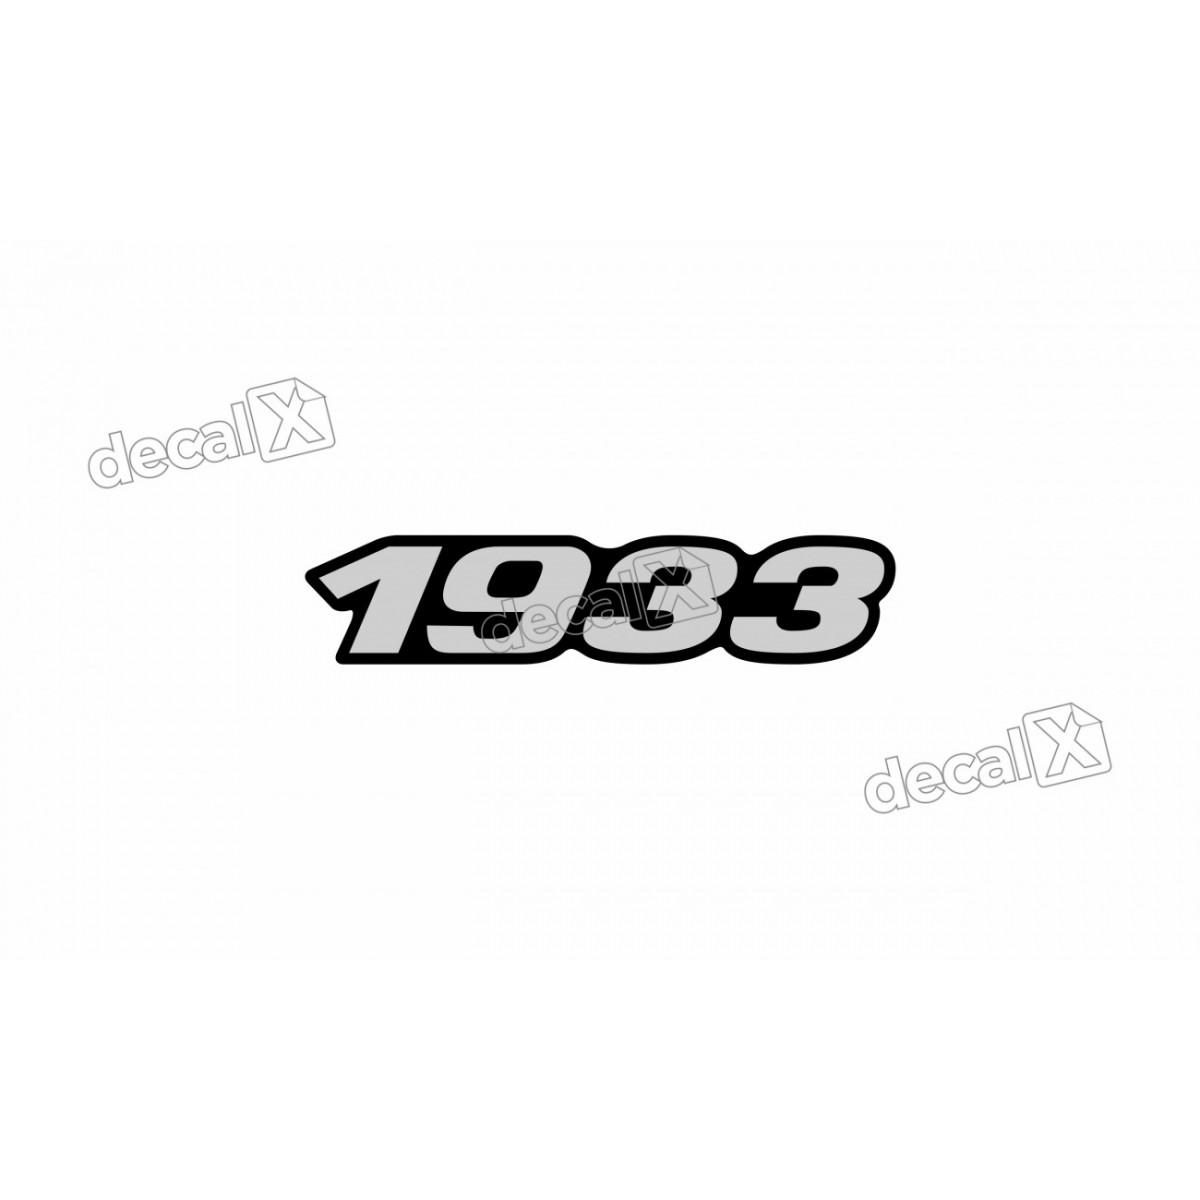 Adesivo Emblema Resinado Mercedes 1933 Cm68 Decalx